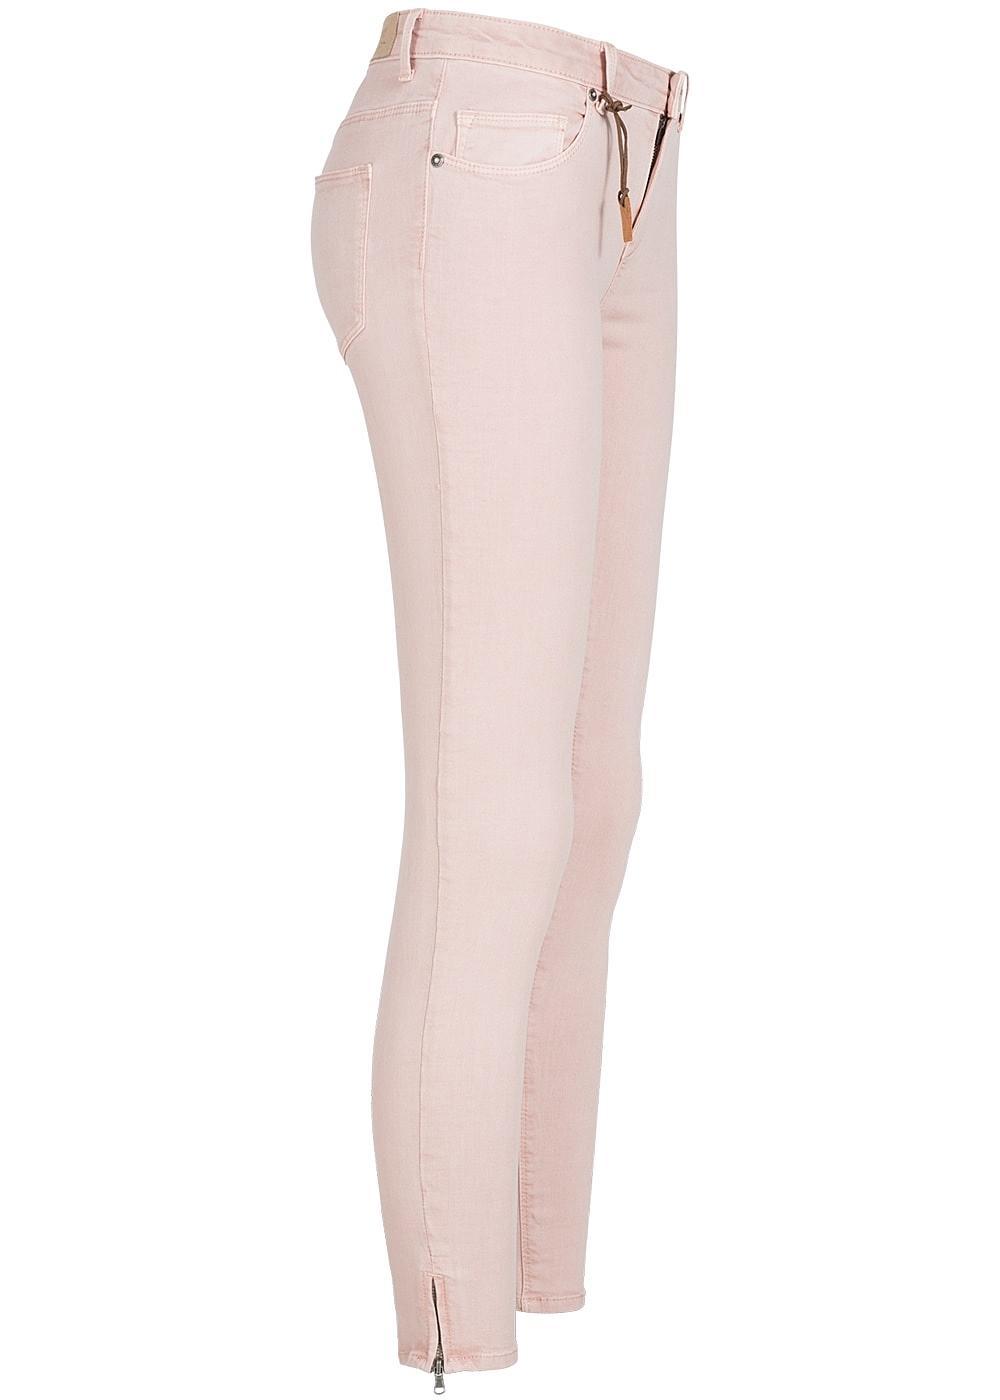 07c8e5dbdc14 ONLY Damen Skinny Jeans Hose 5-Pockets Knöchellang Zipper NOOS peach ...